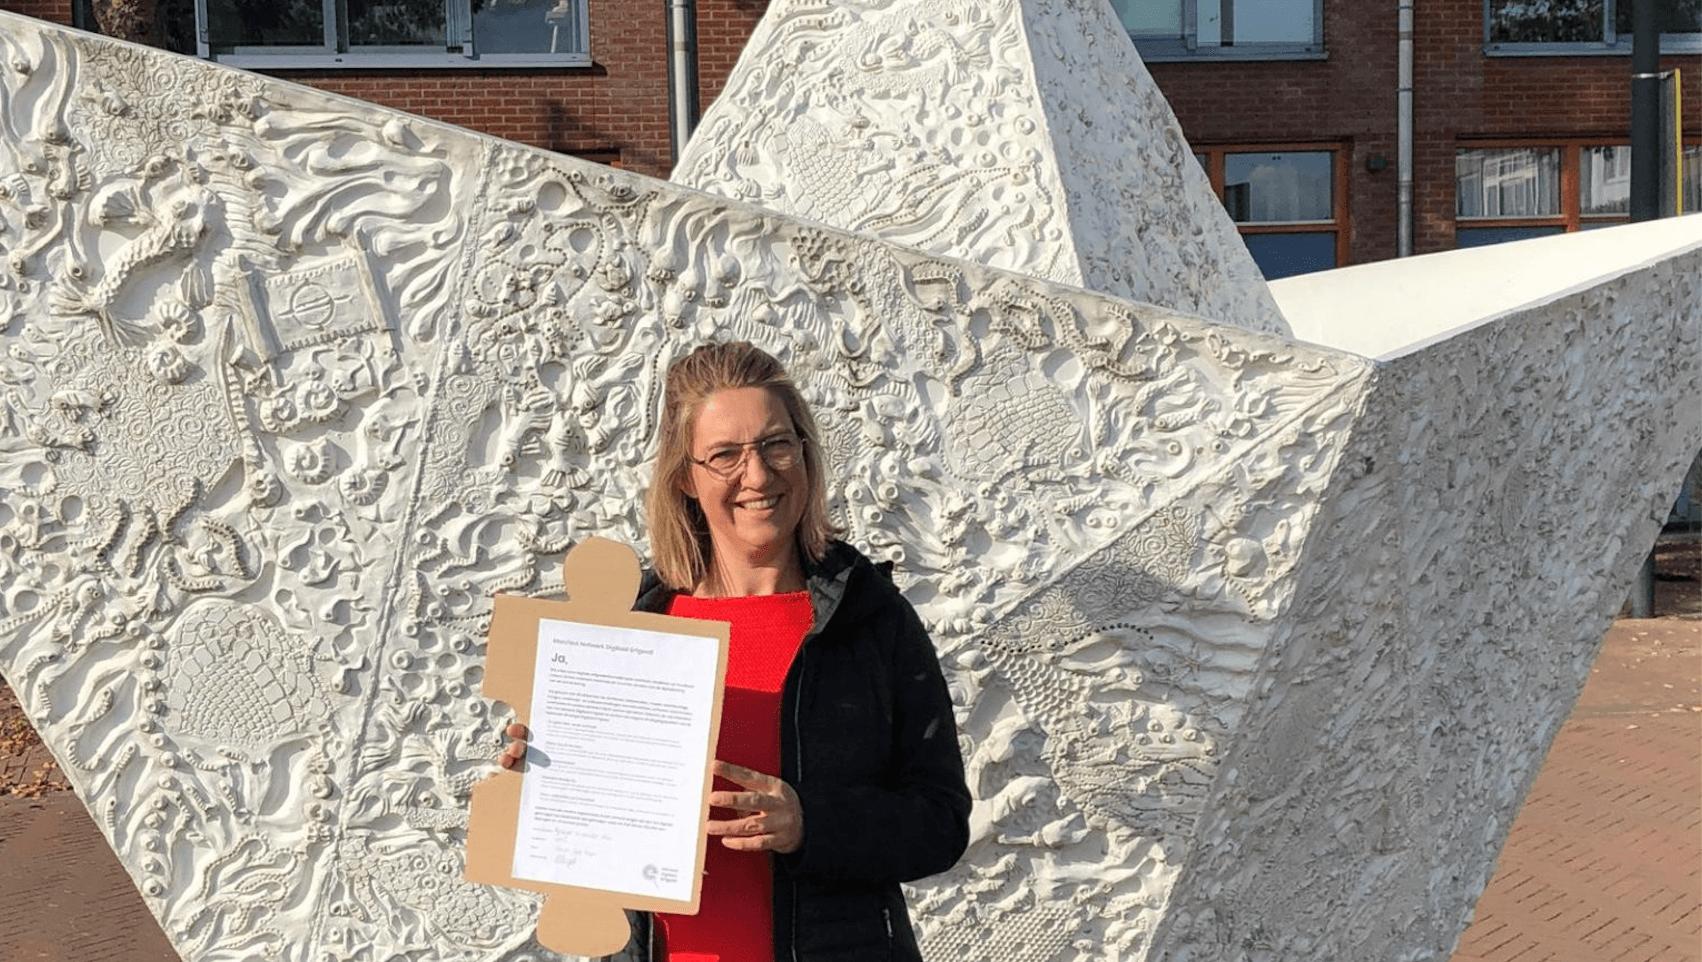 VHIC-directeur Tineke van Heijst met het ondertekende NDE-manifest